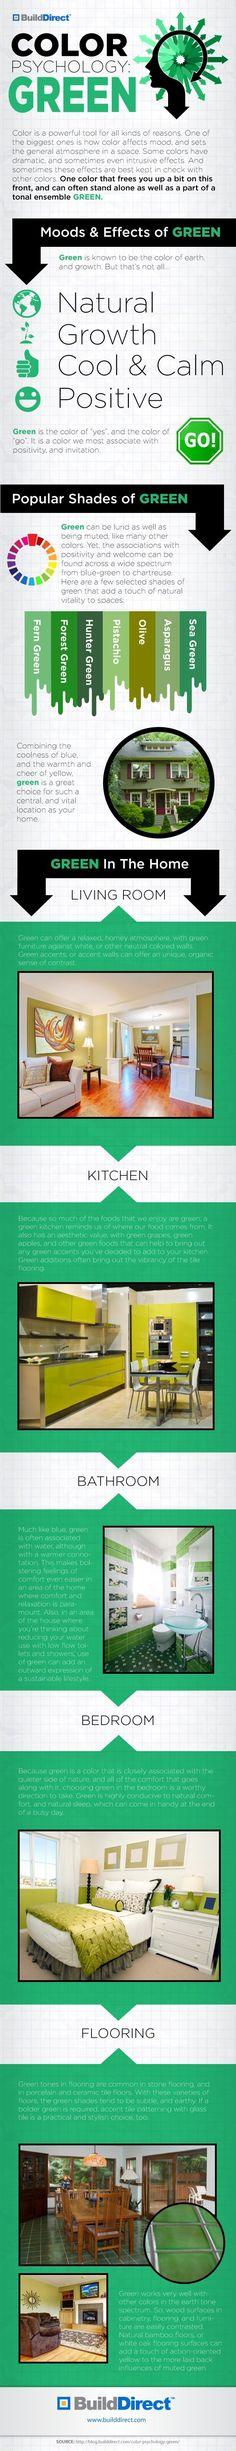 Color Psychology Green copy Emotional Interior Design: Using Green